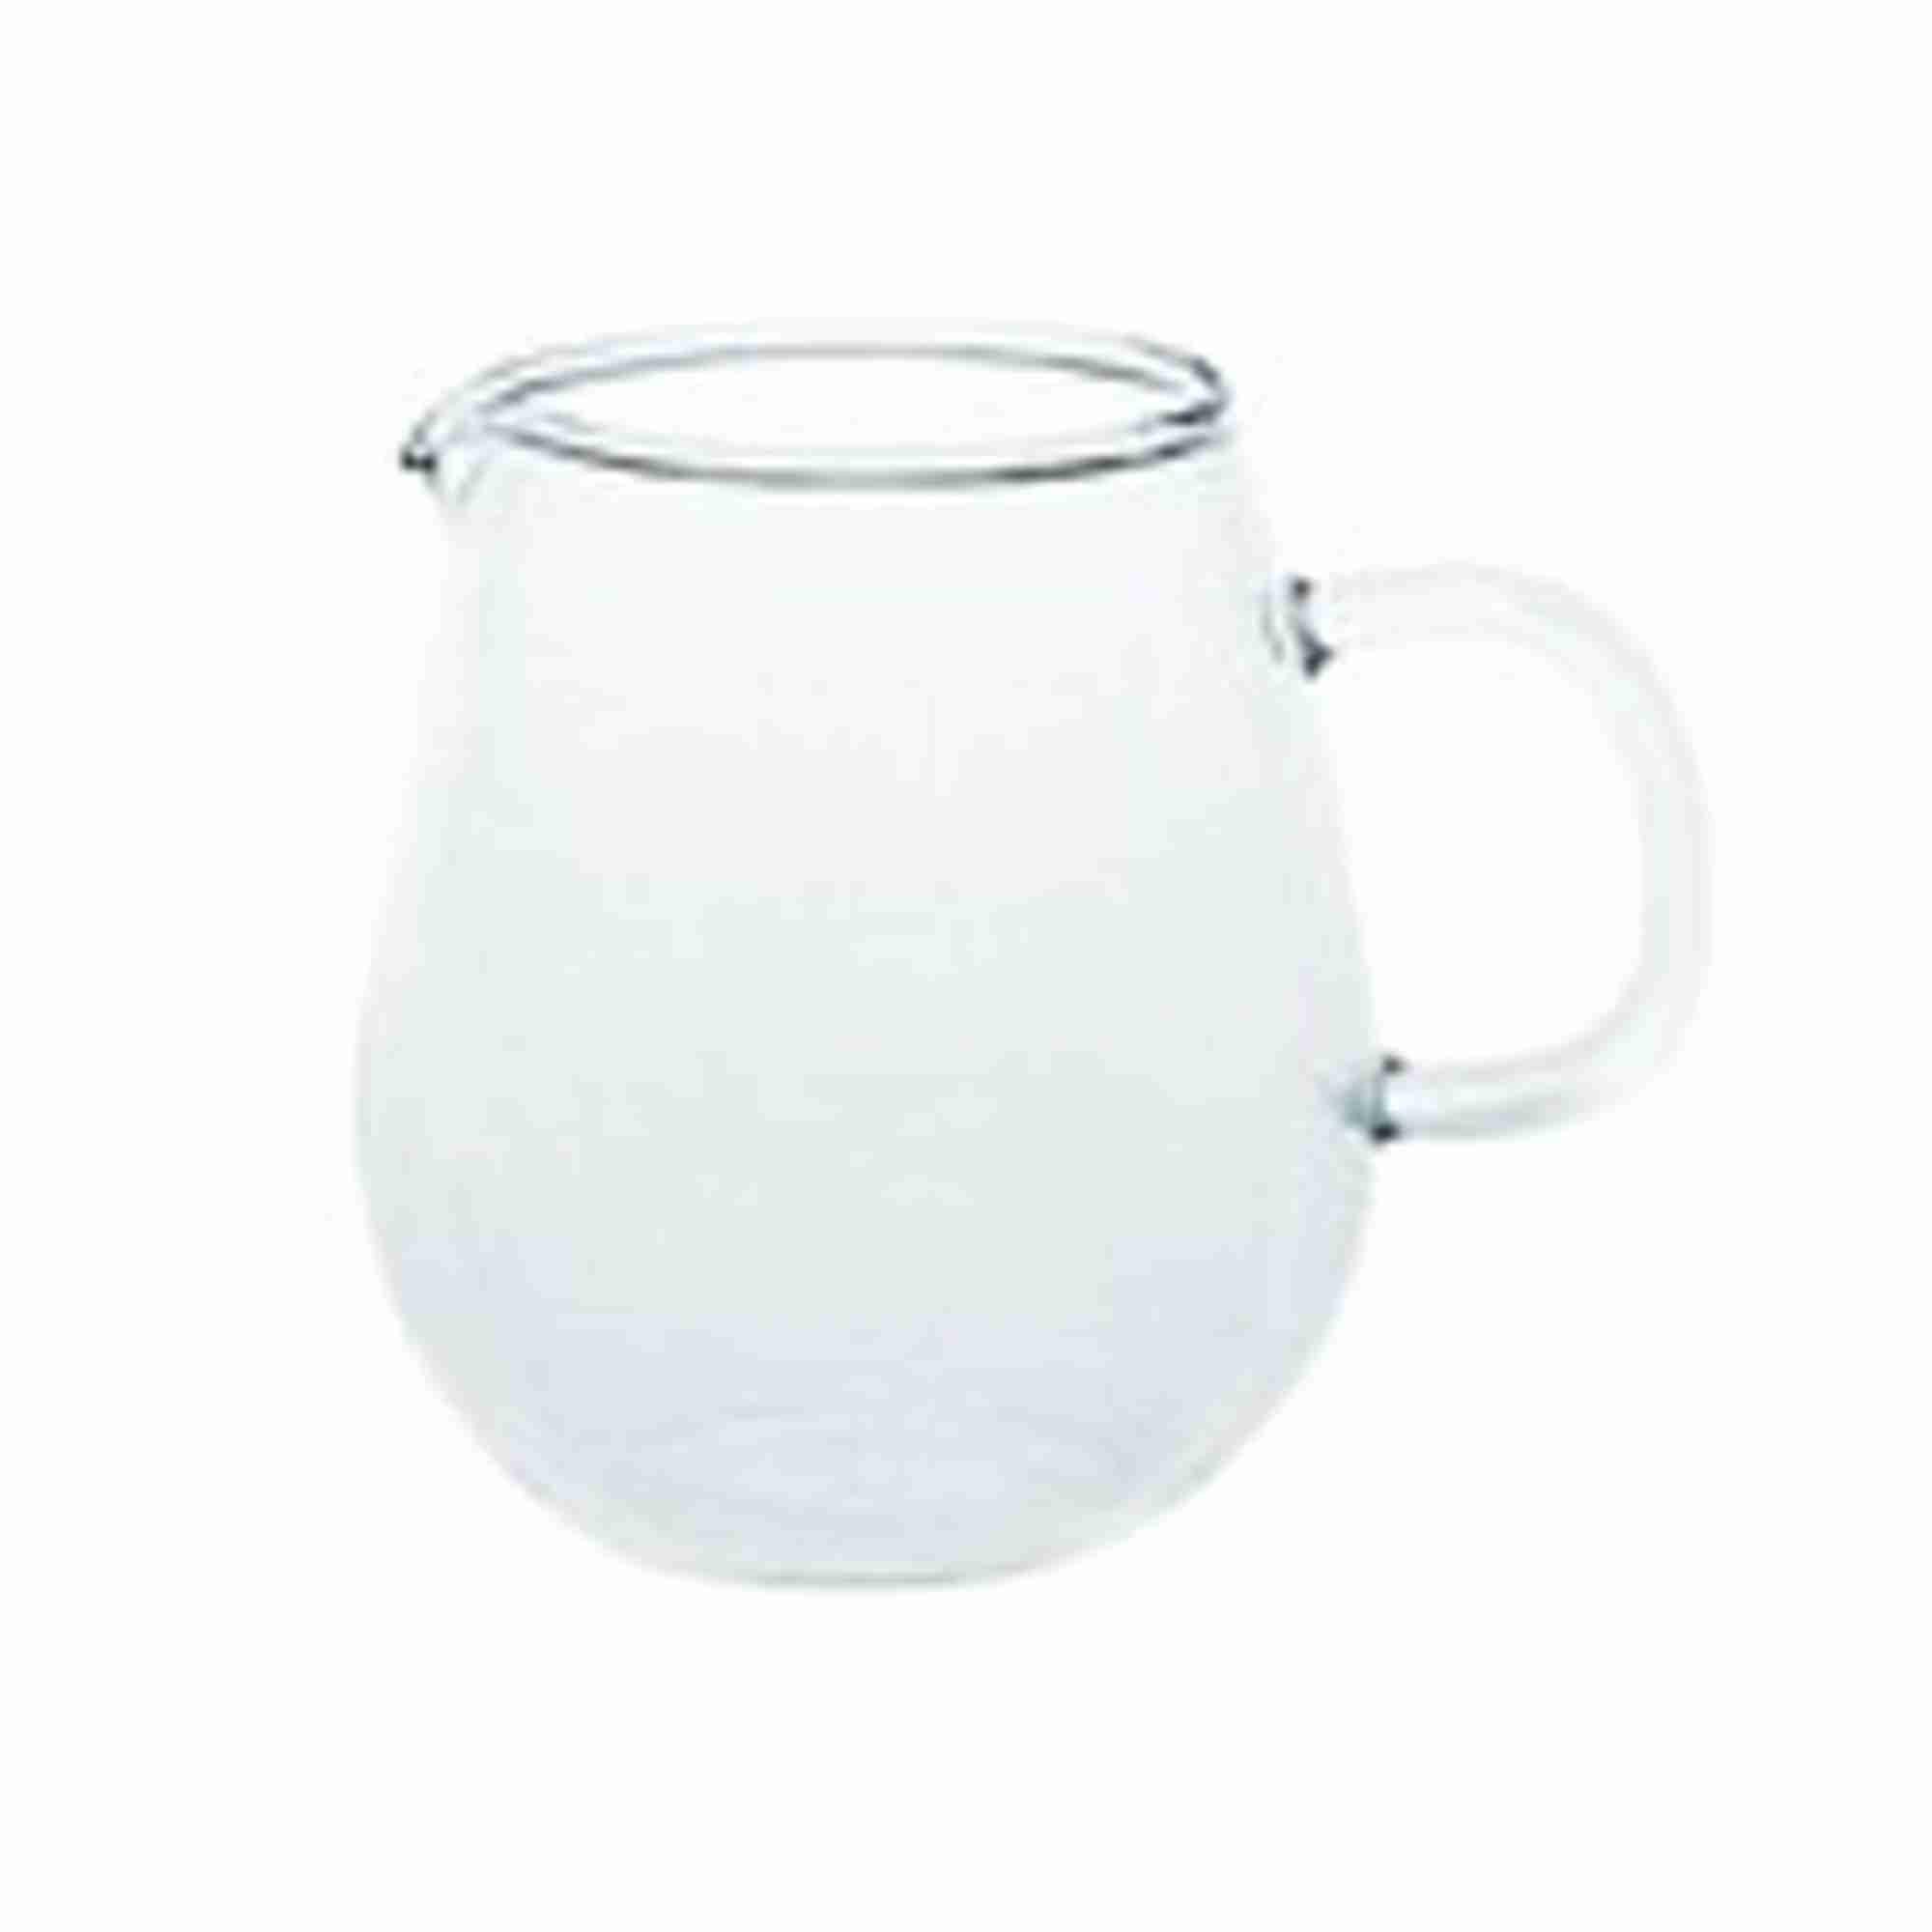 The UNITEA Mini Glass Milk Pitcher or Jug by Kinto Japan